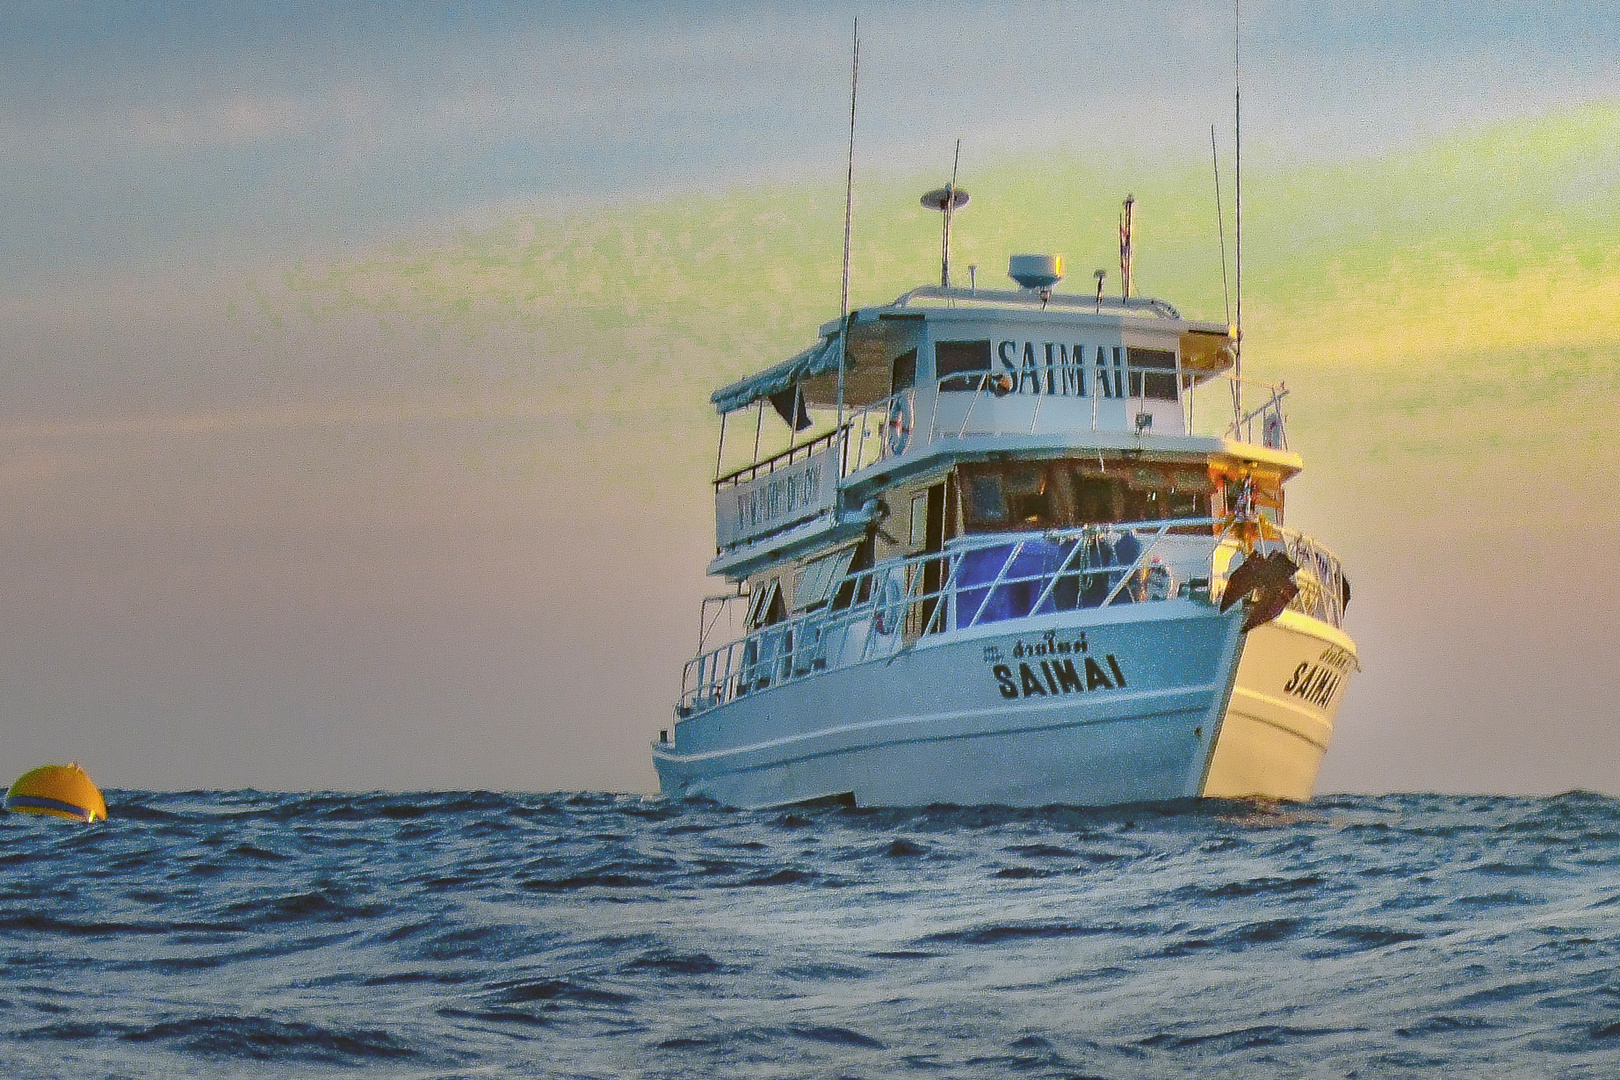 Saimai the boat for many tours